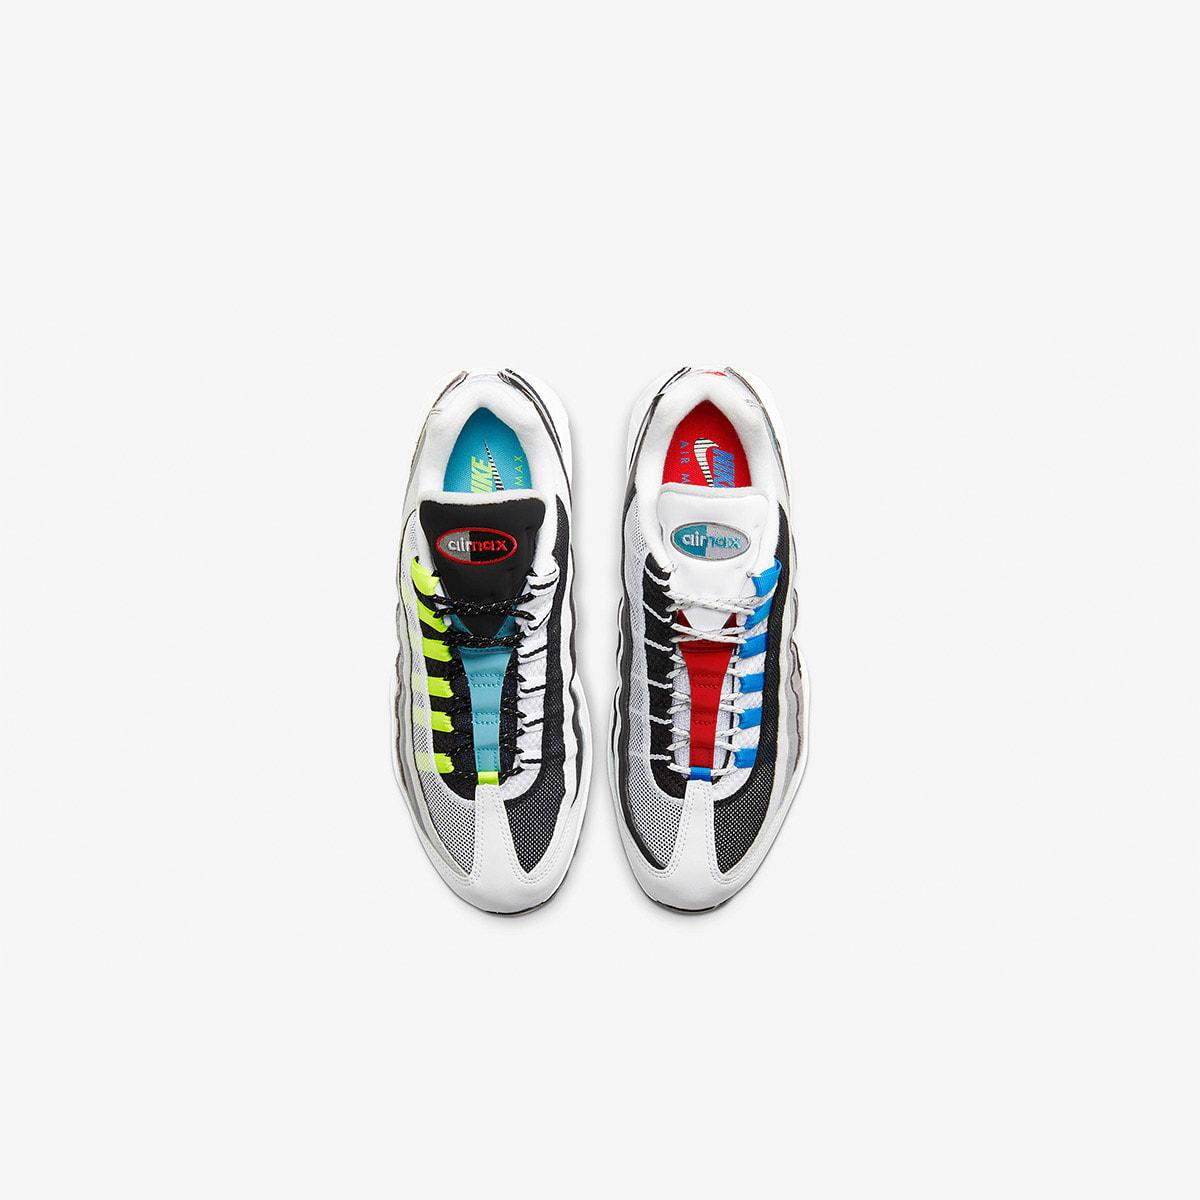 Nike Air Max 95 Premium Greedy 2.0 - CJ0589-001